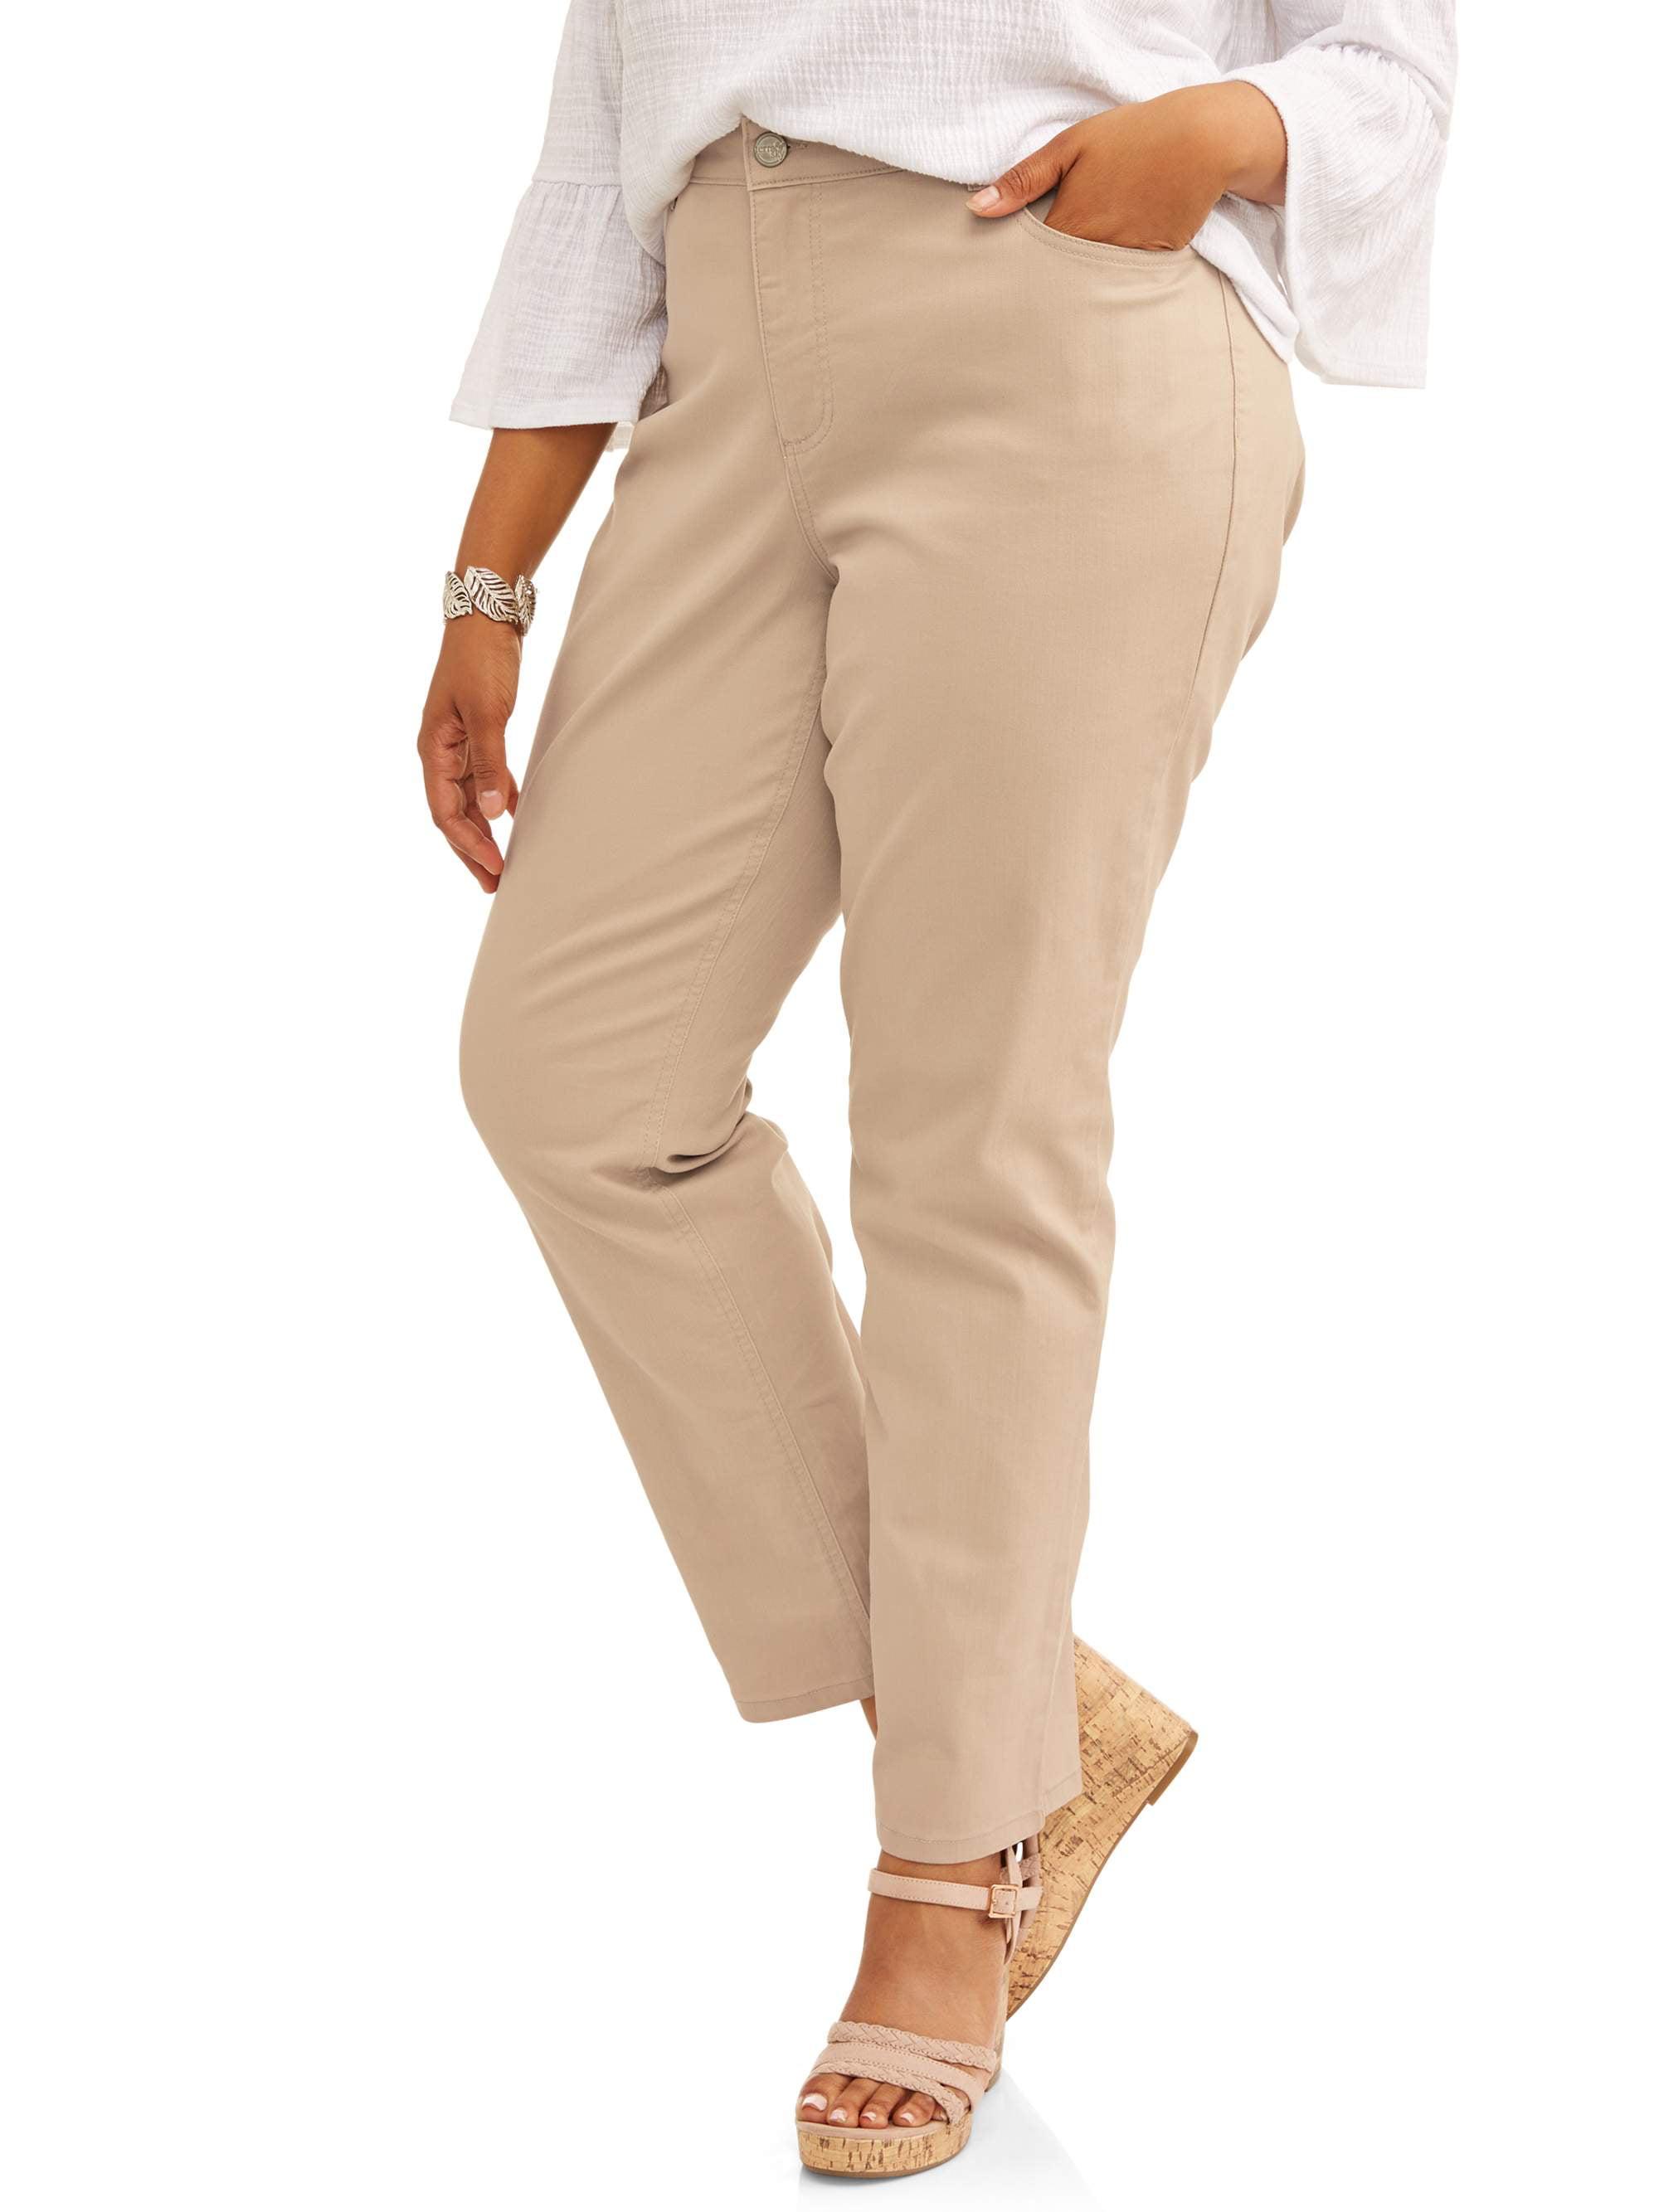 NEW Terra /& Sky Plus Size Repreve Denim 5-Pocket Classic Straight Leg Jean Women